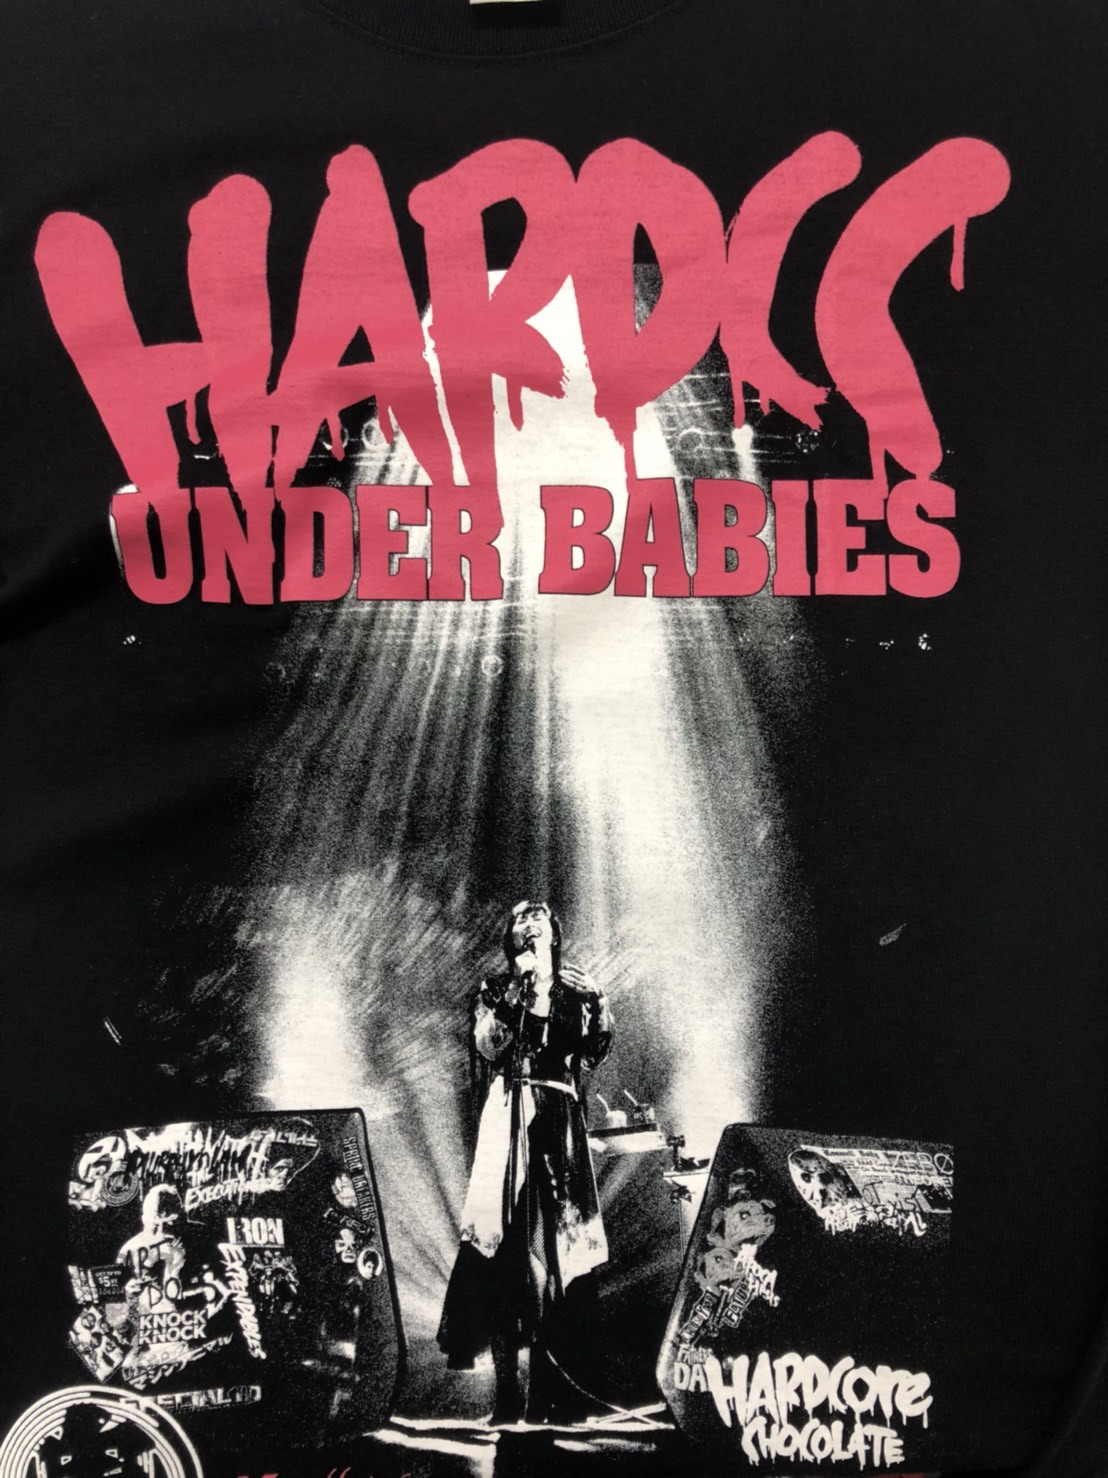 UNDER BABIES×ハードコアチョコレート コラボTシャツ(ピンク/グレー)